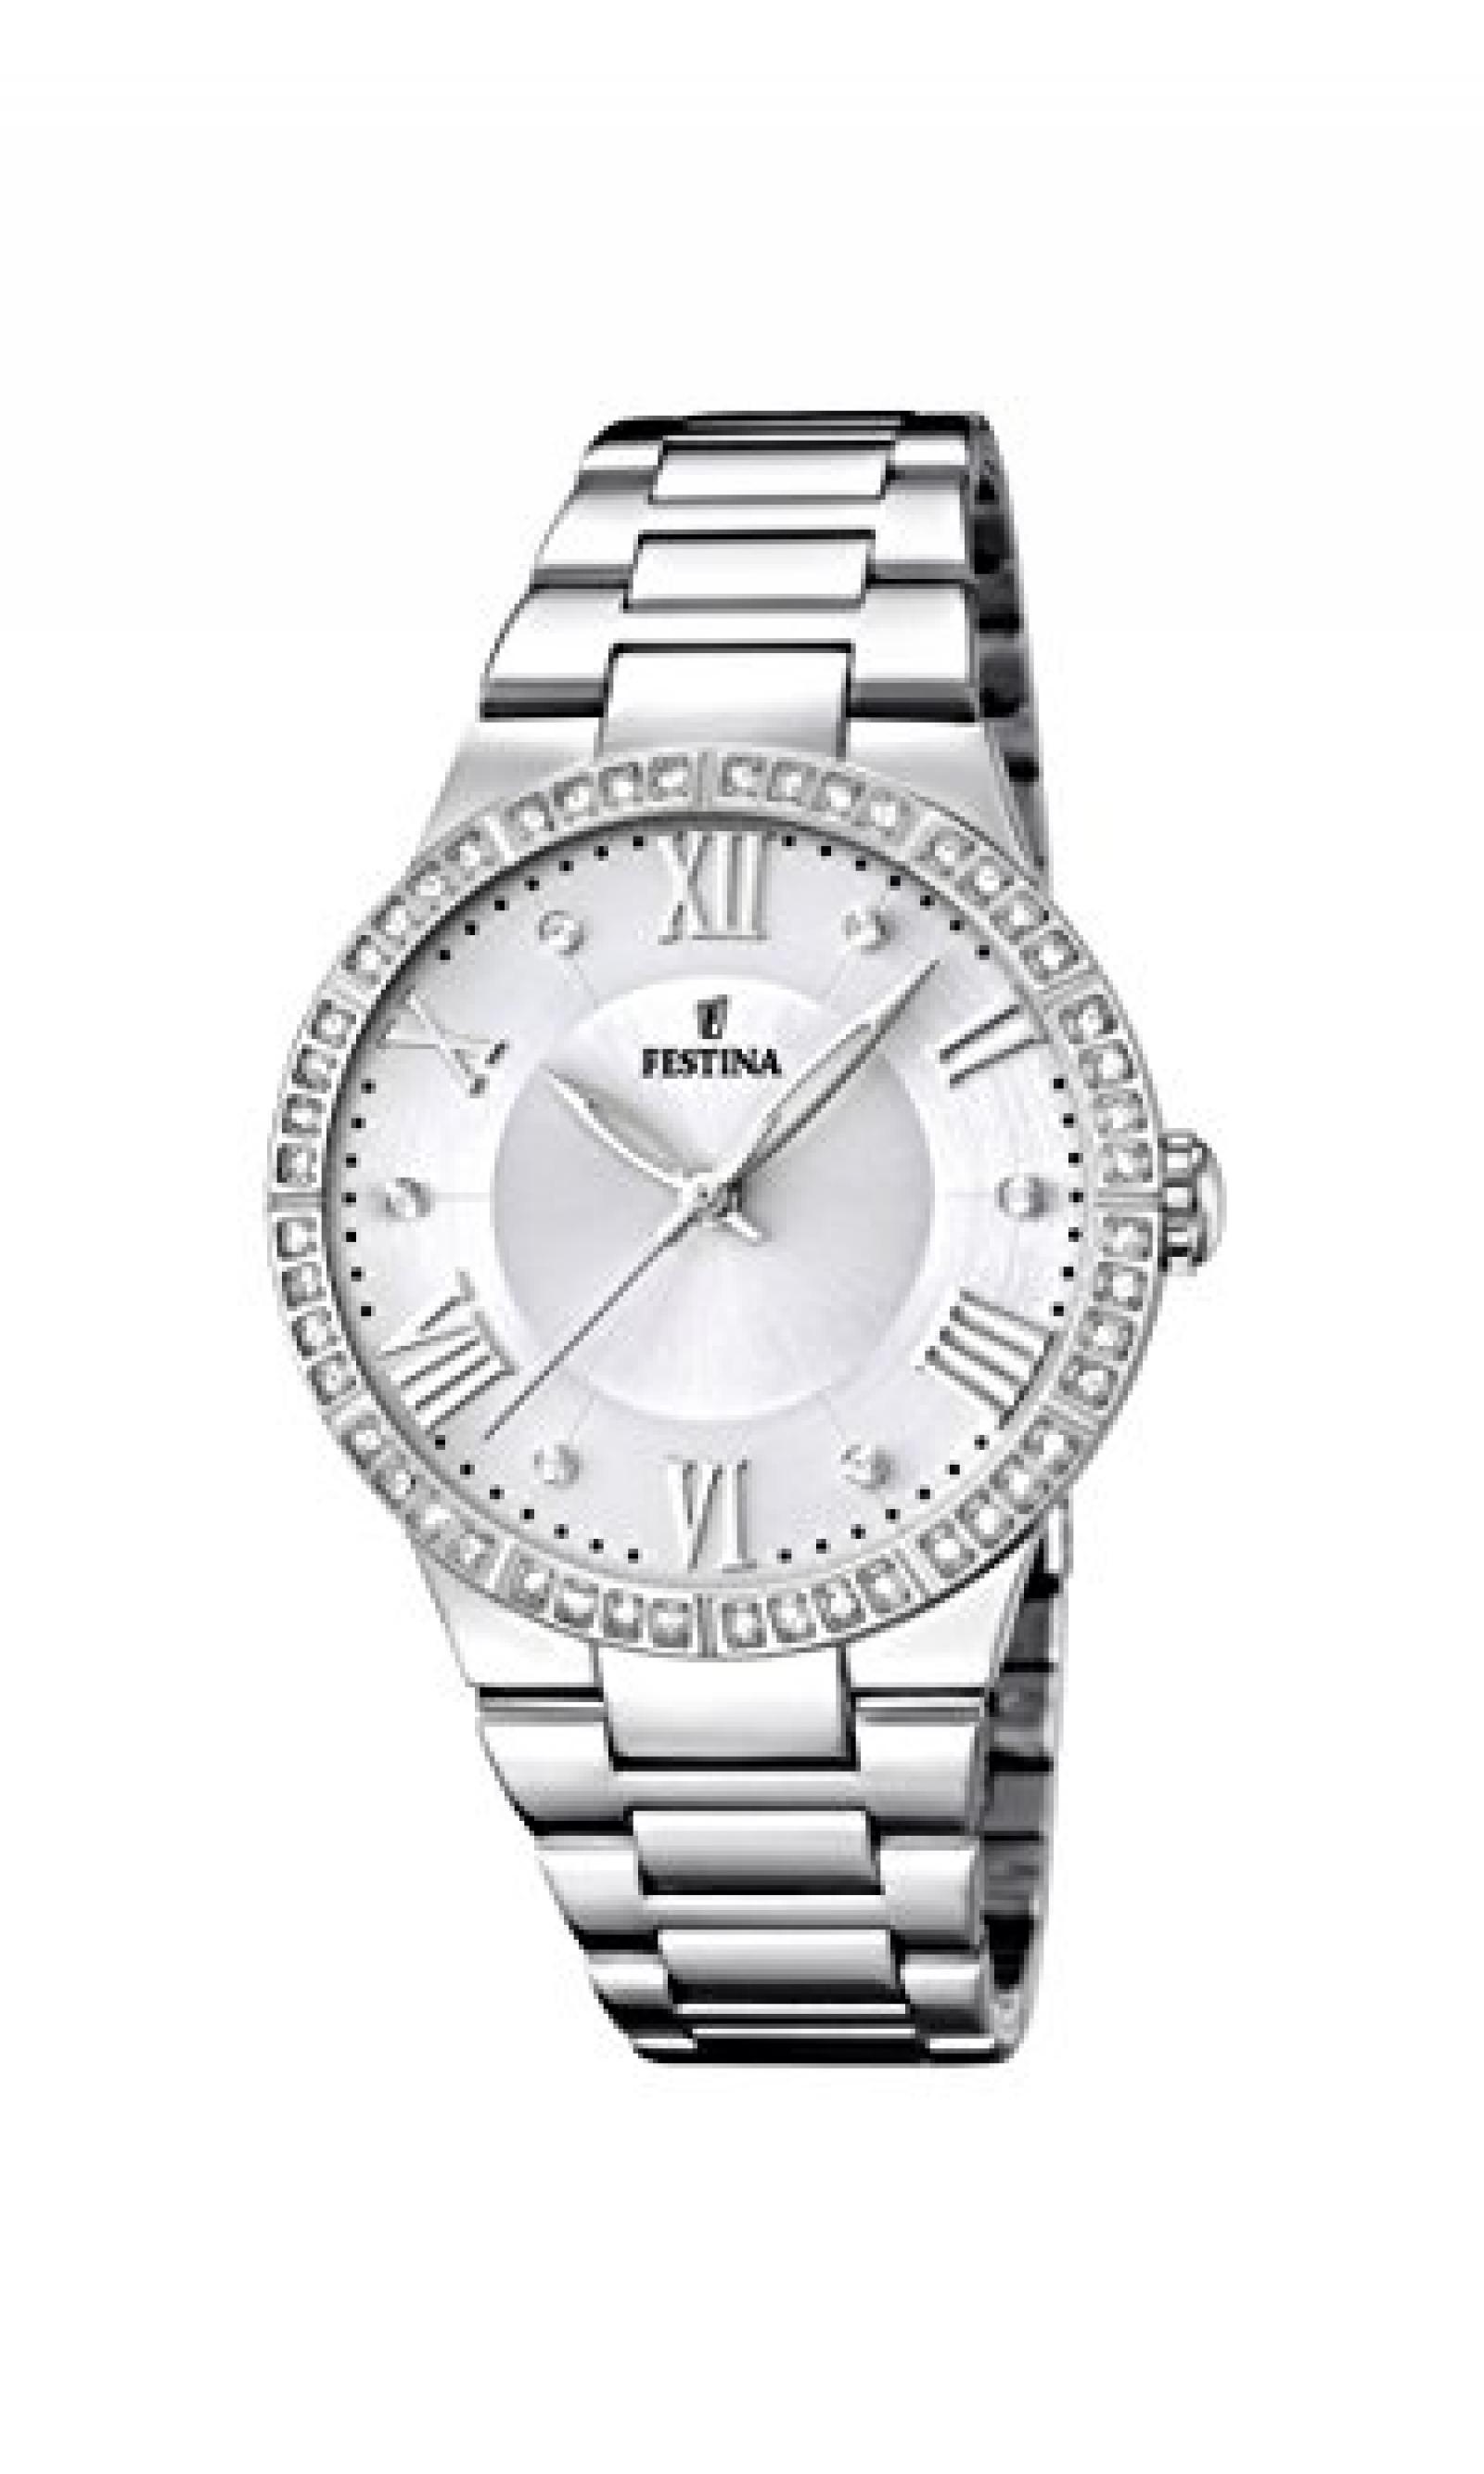 Festina Damen-Armbanduhr Analog Quarz Edelstahl F16719/1